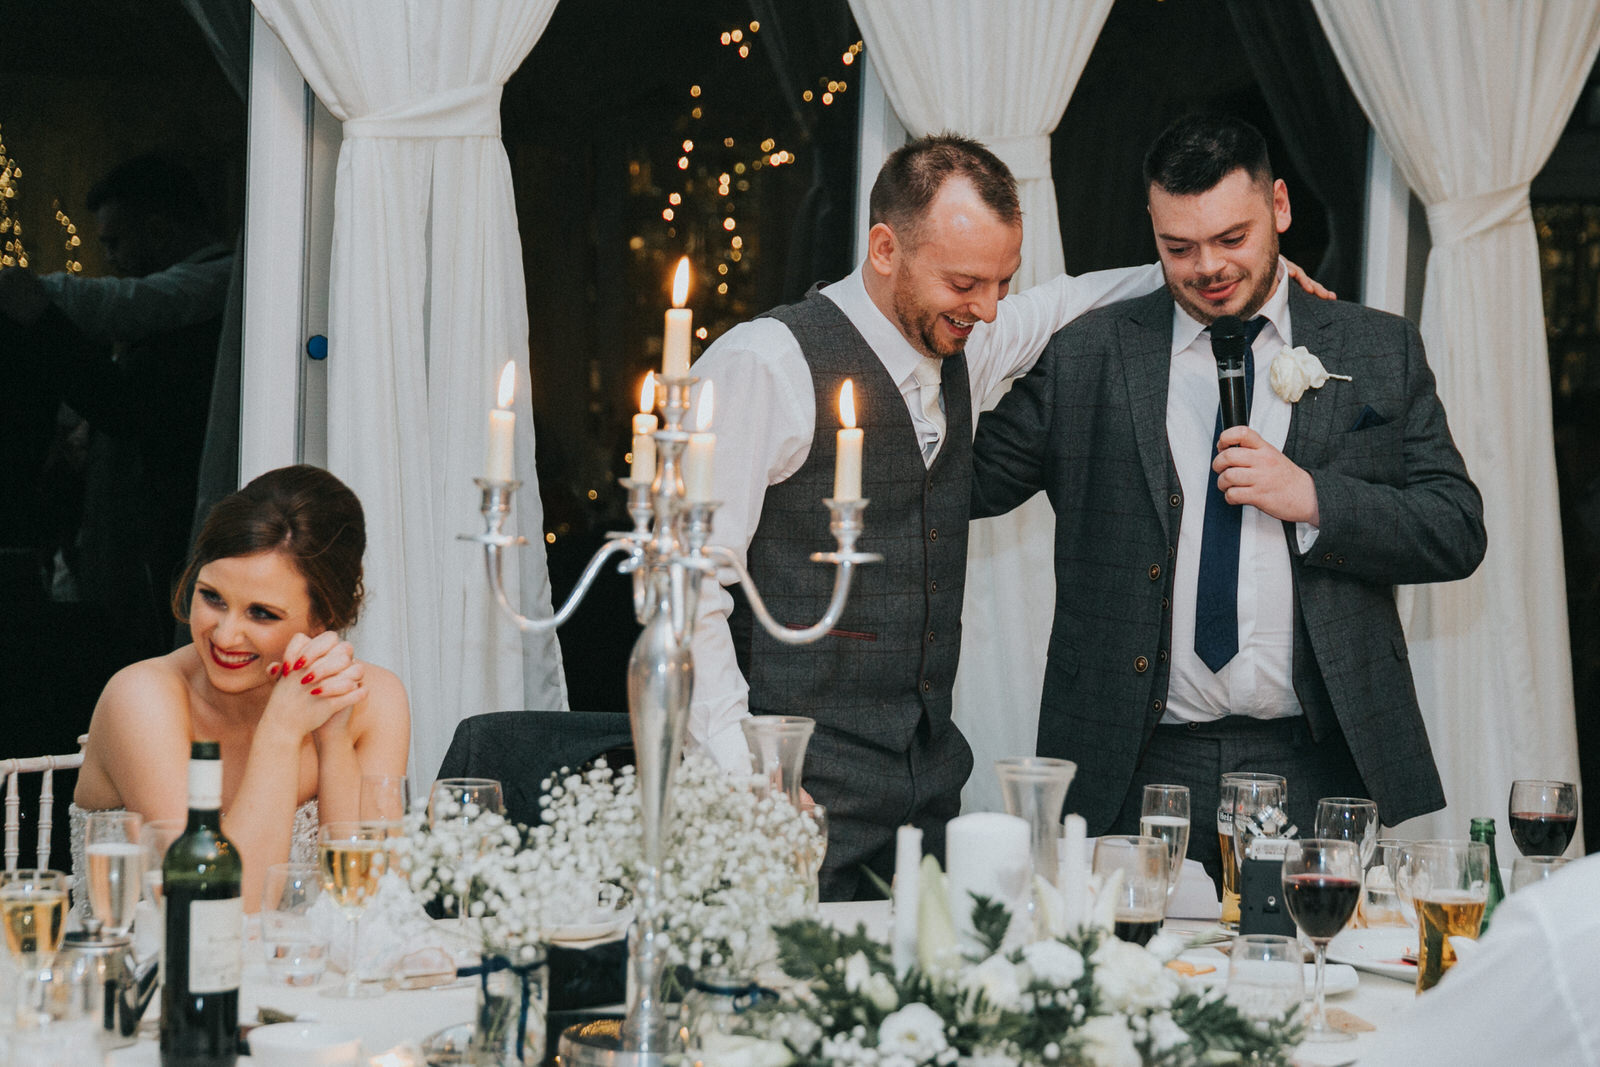 Clonabreany_wedding-photographer_roger_kenny_ireland_109.jpg